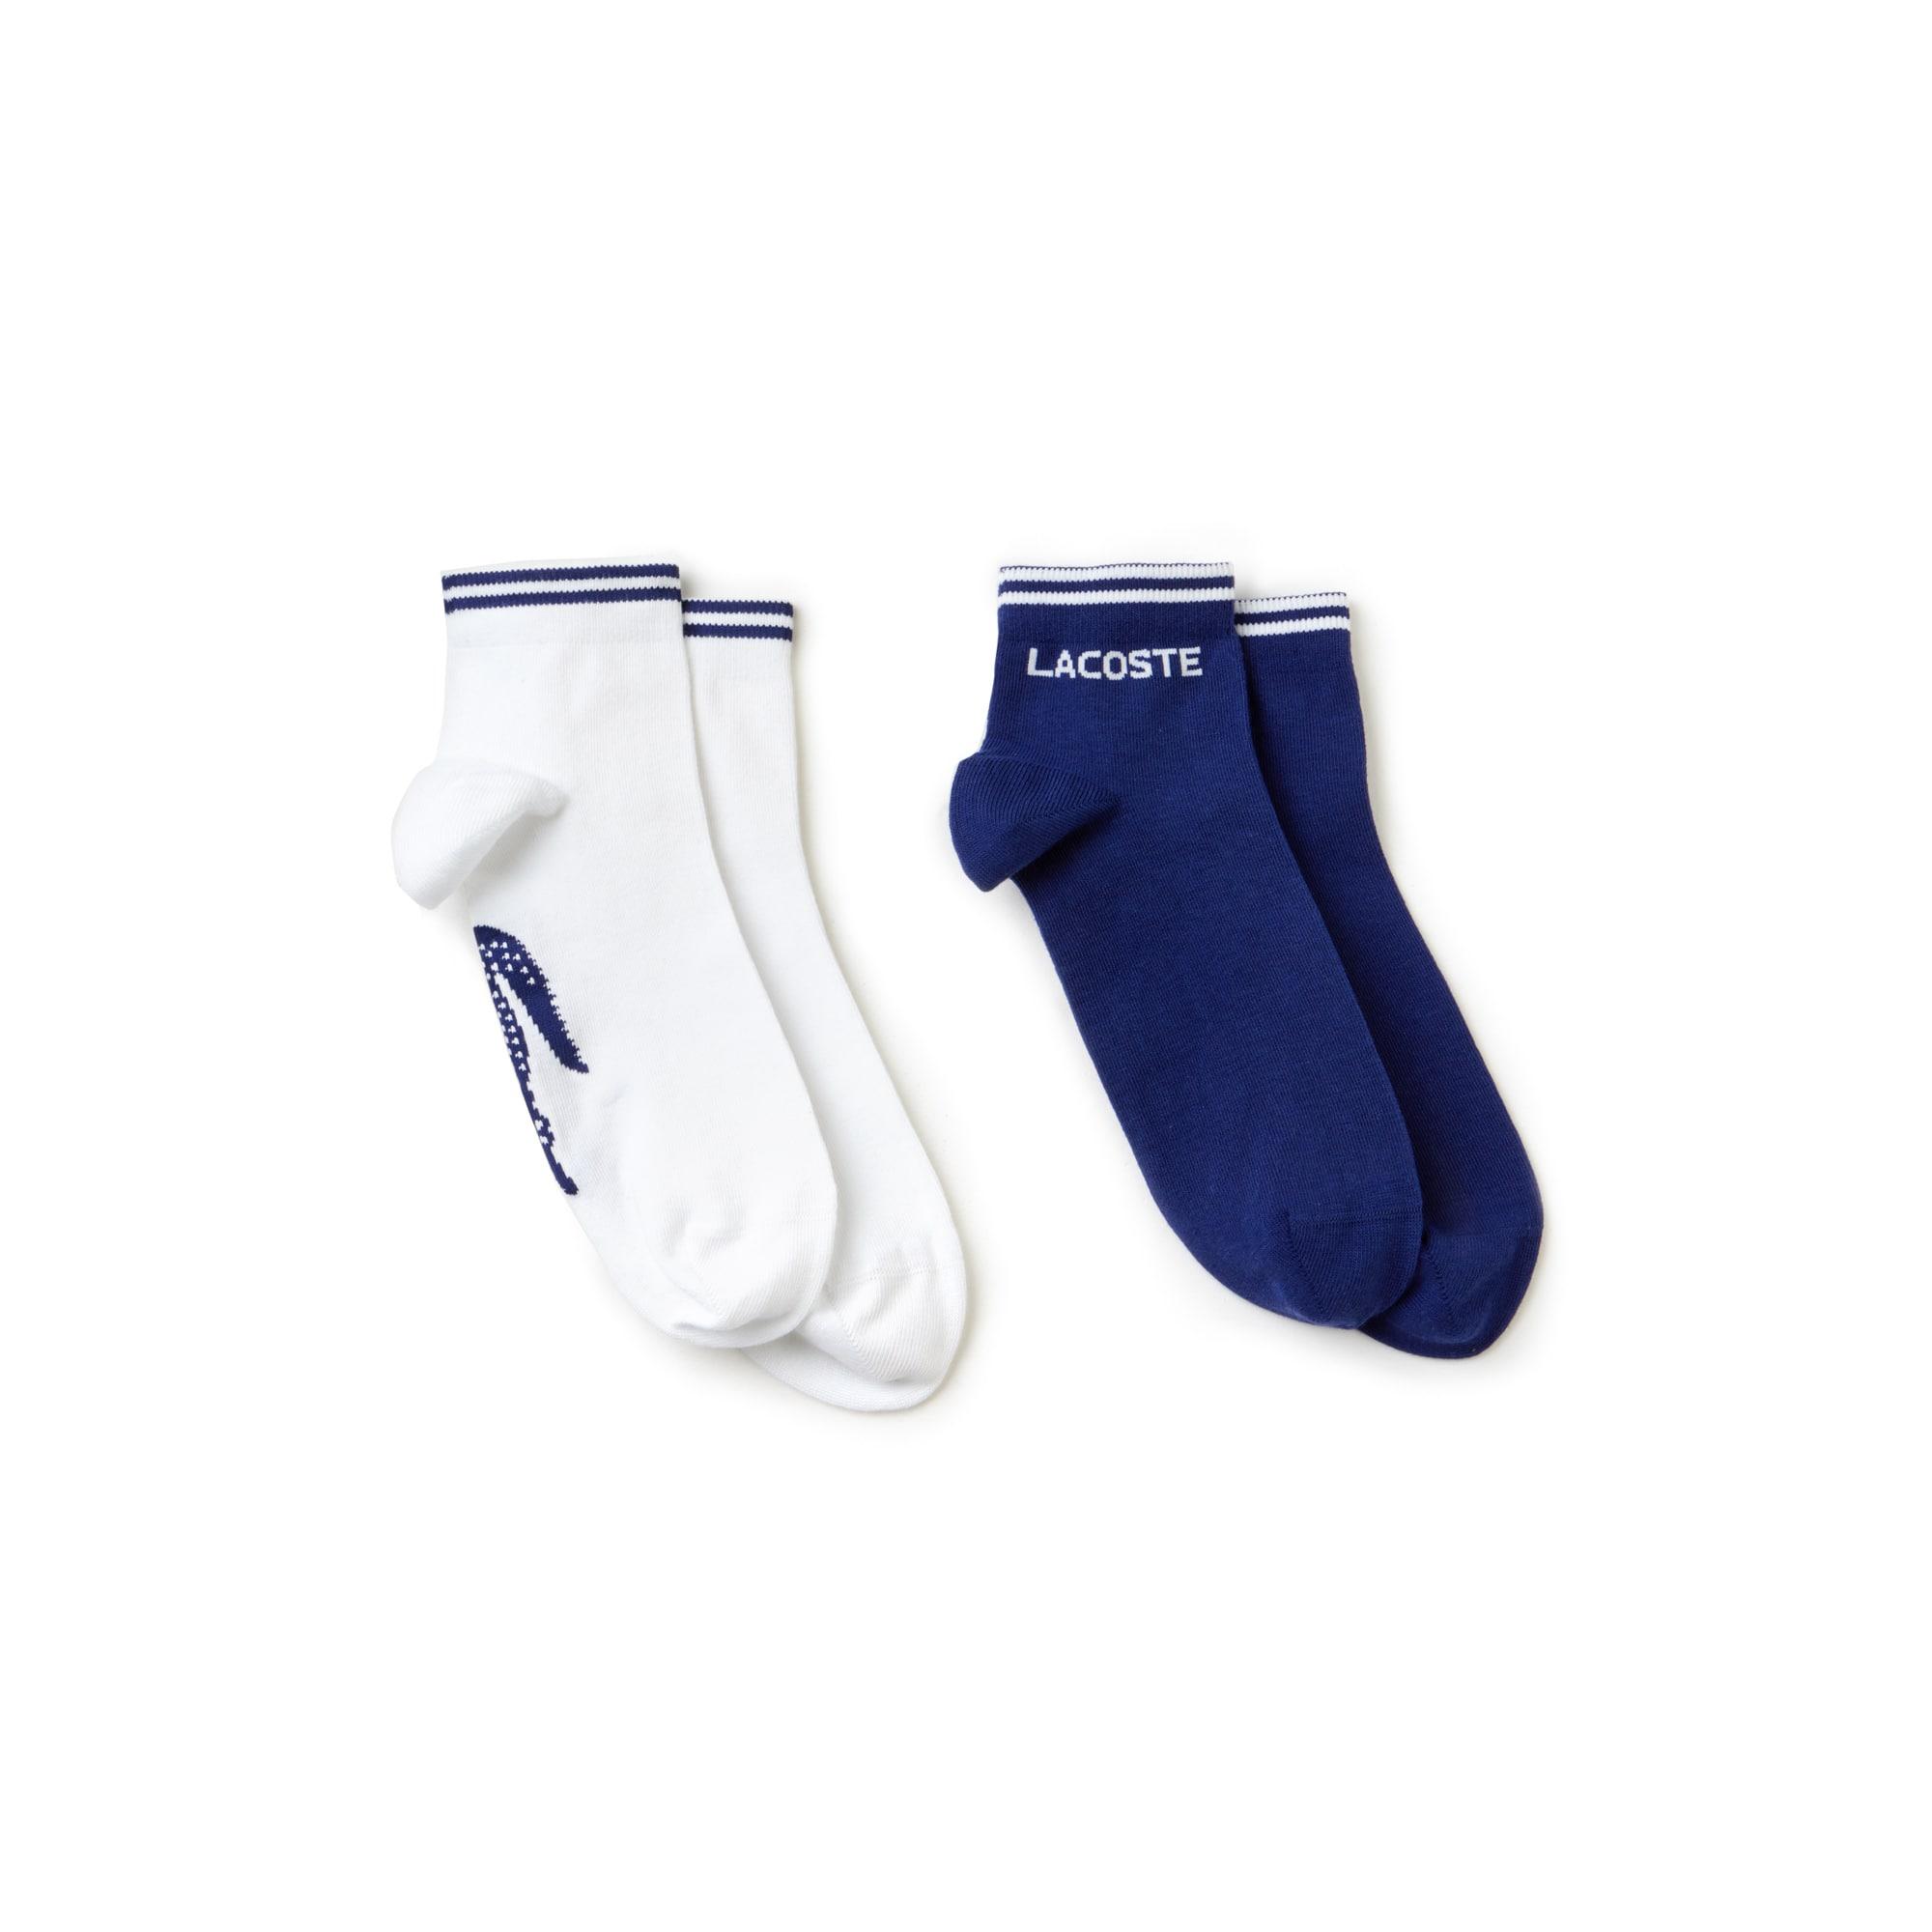 Men's Two-pack of Lacoste Tennis low-cut socks in jacquard jersey